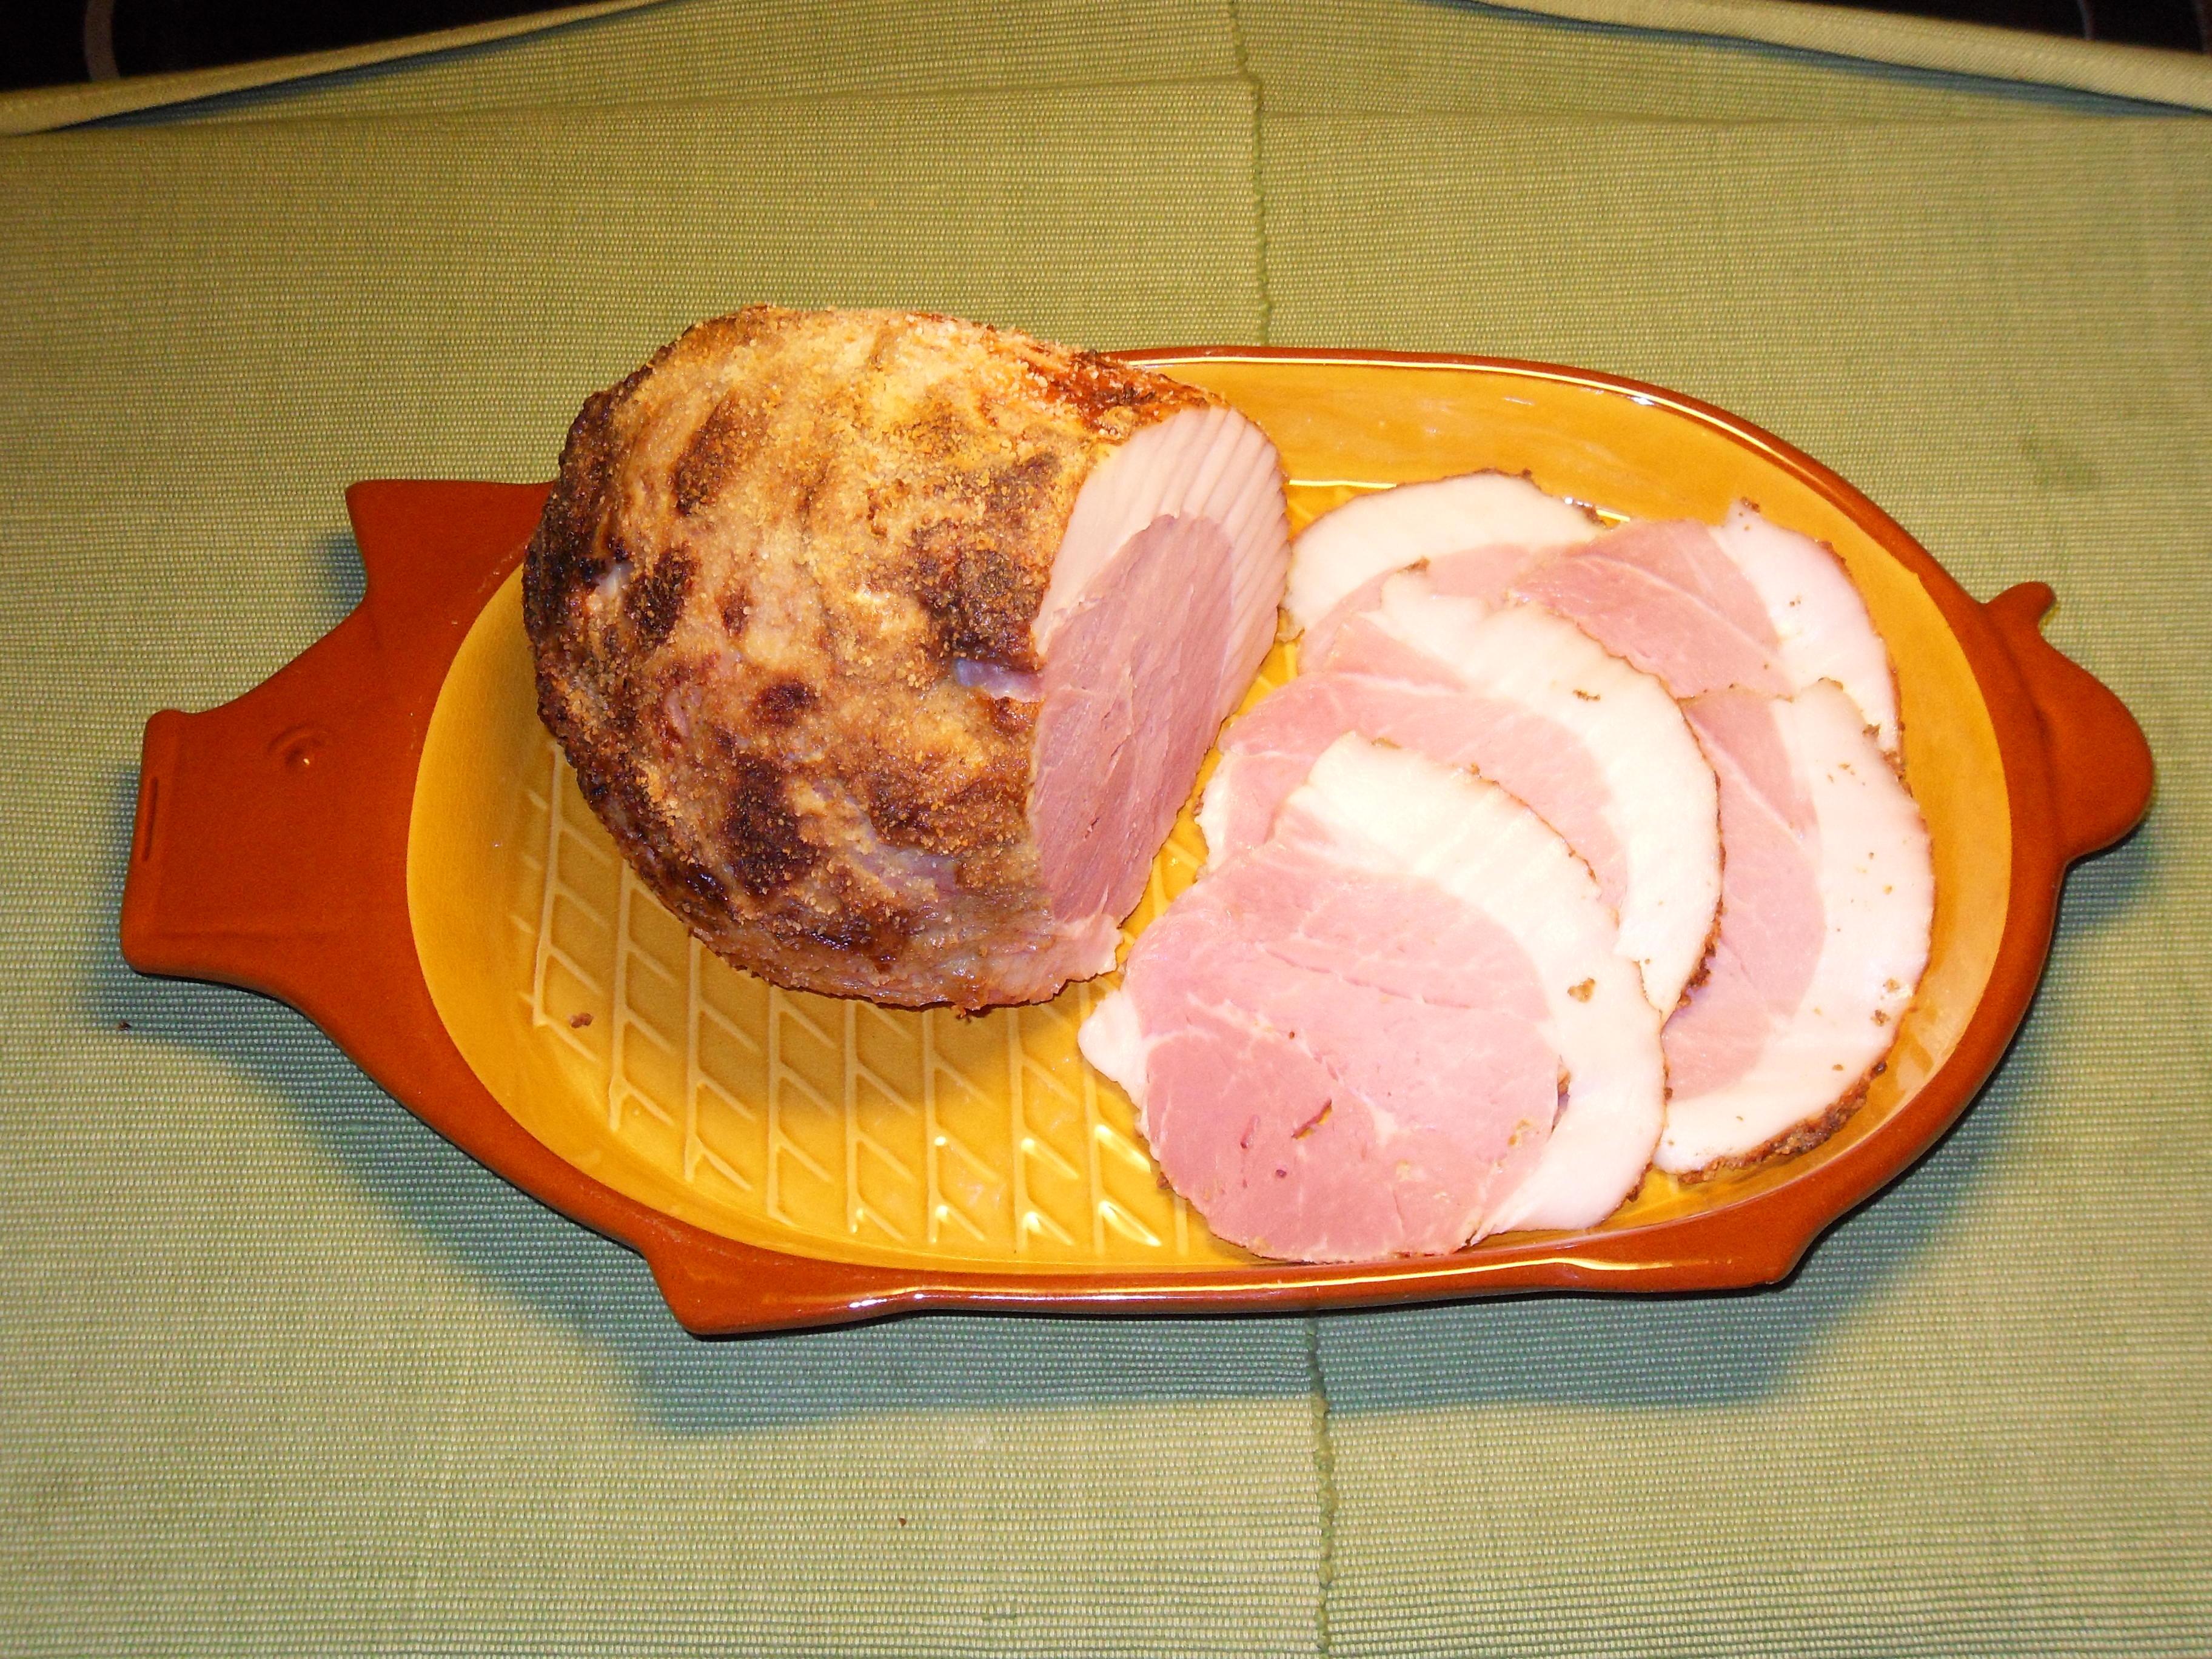 Nygammal griljerad skinka